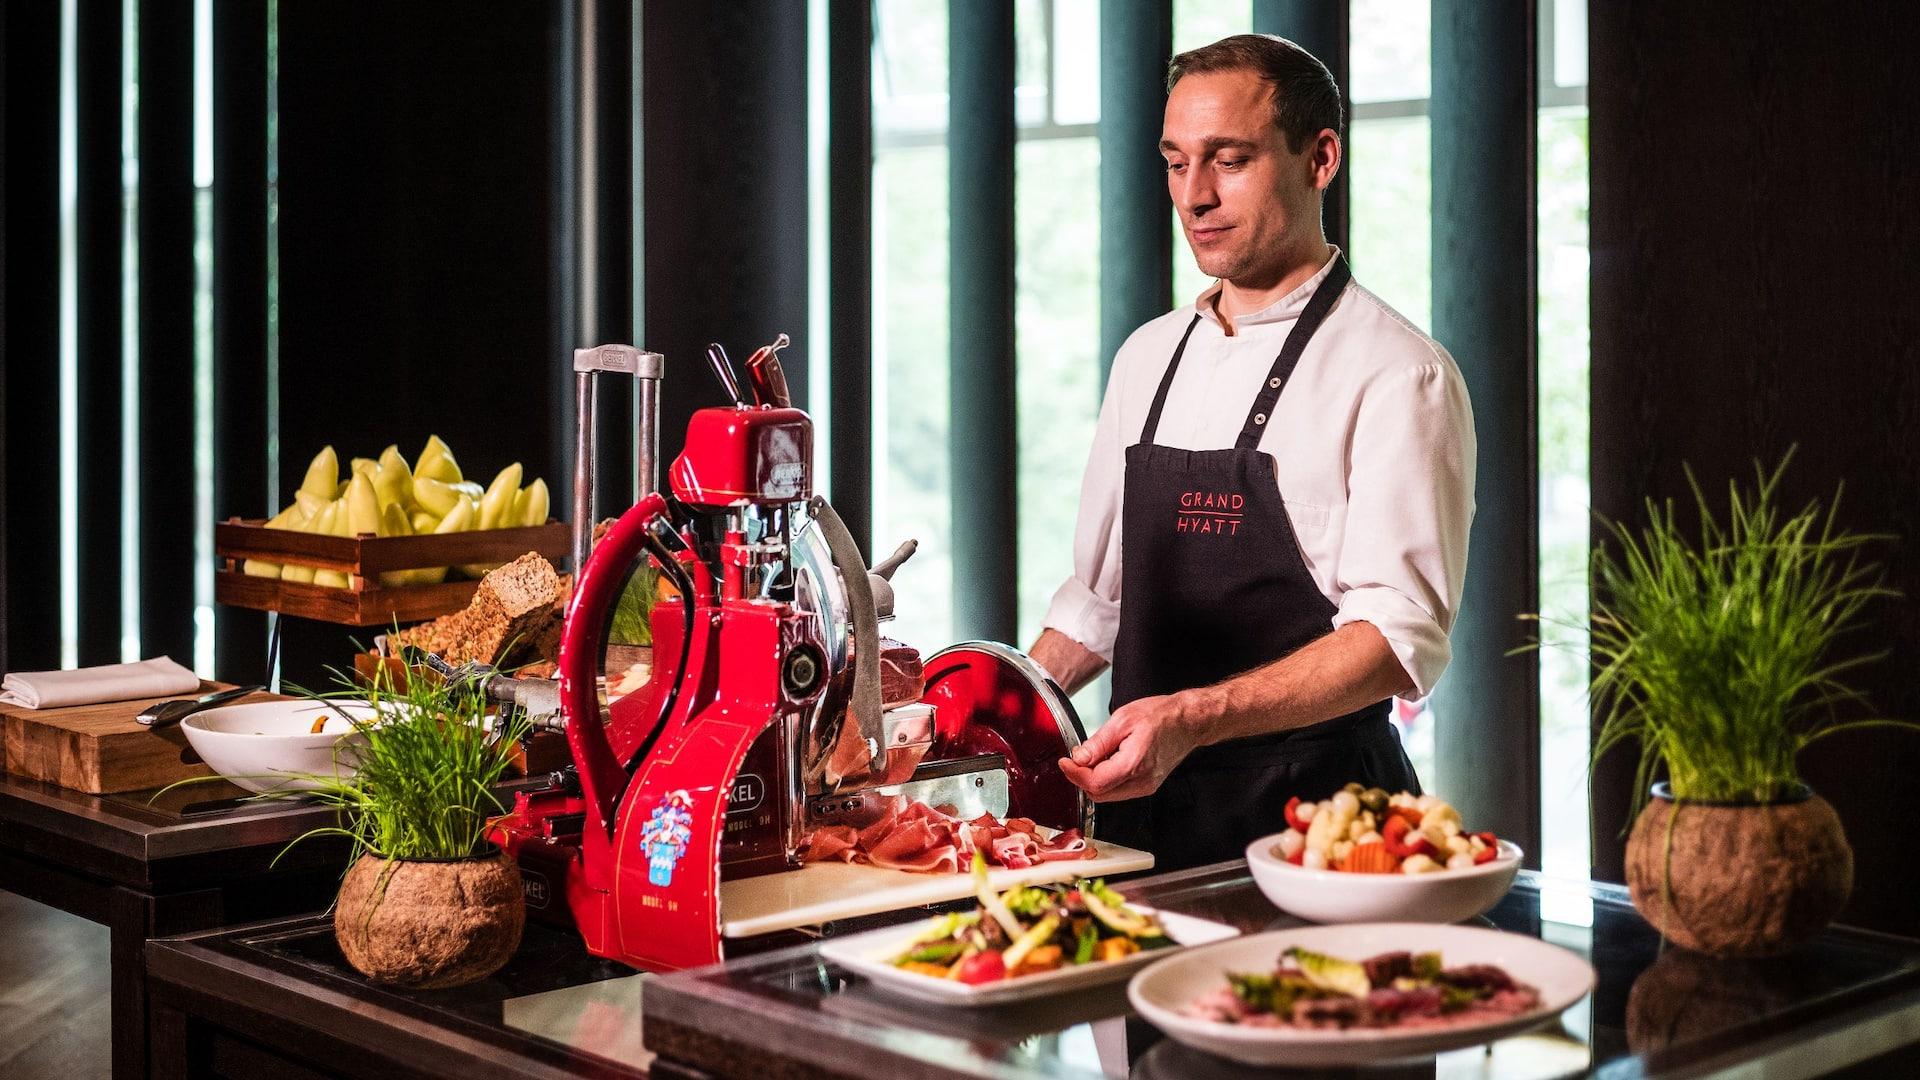 Personal catering service at Grand Hyatt Berlin